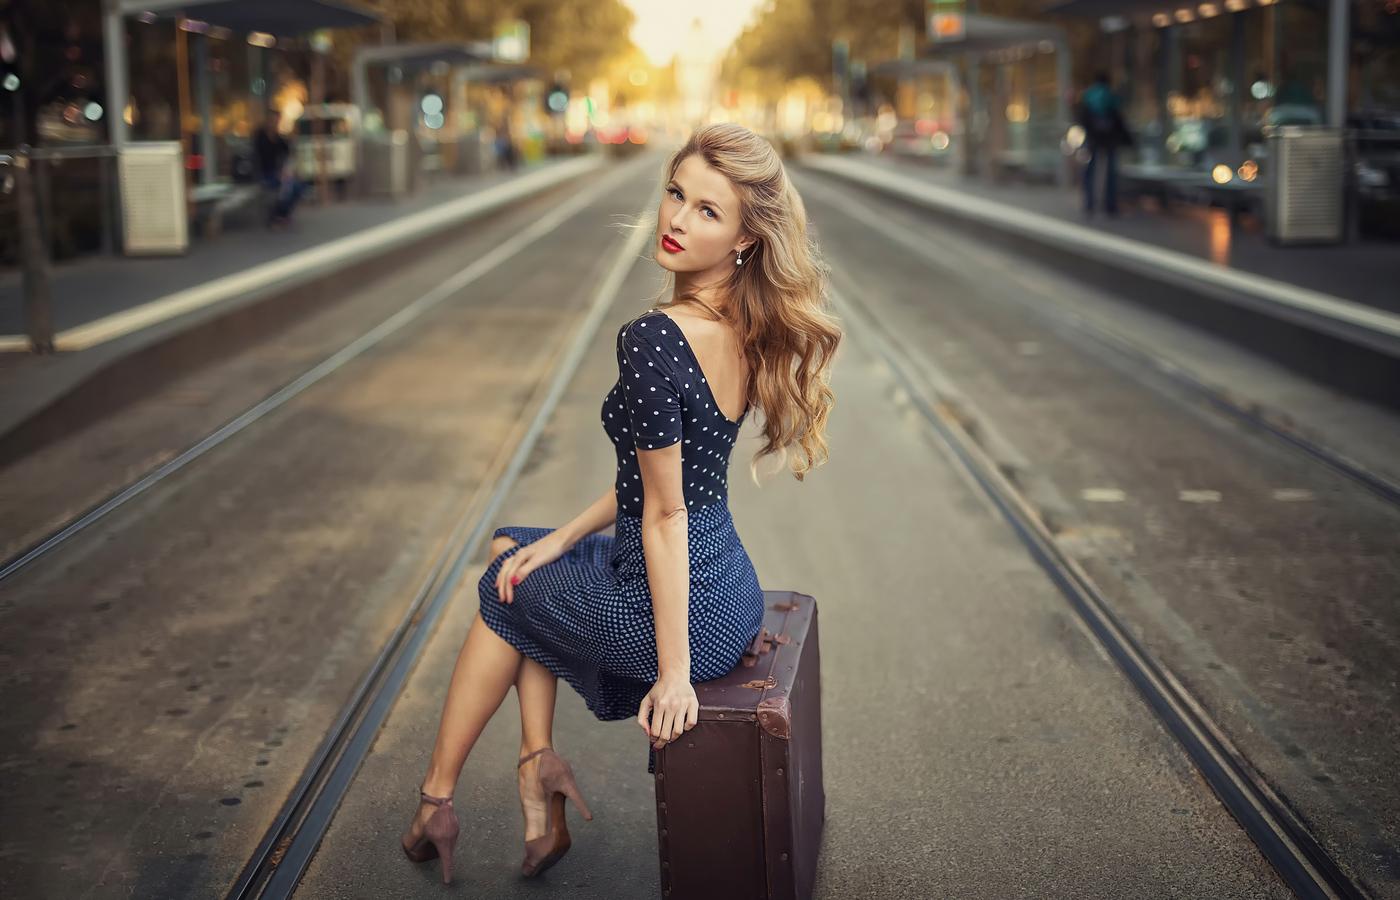 blonde-girl-sitting-suitcase-train-station-4k-88.jpg